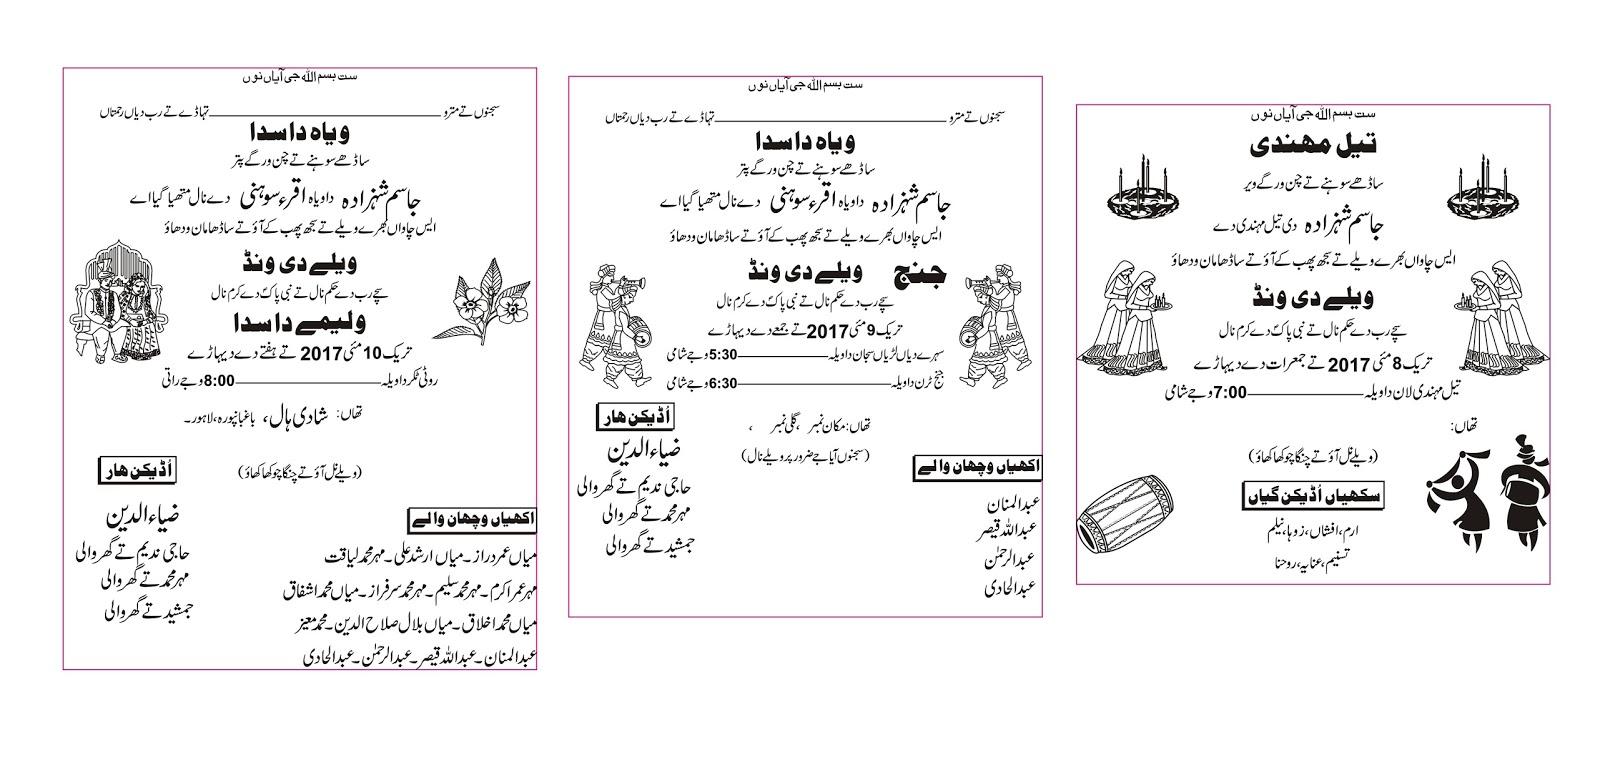 how to write zohair in urdu